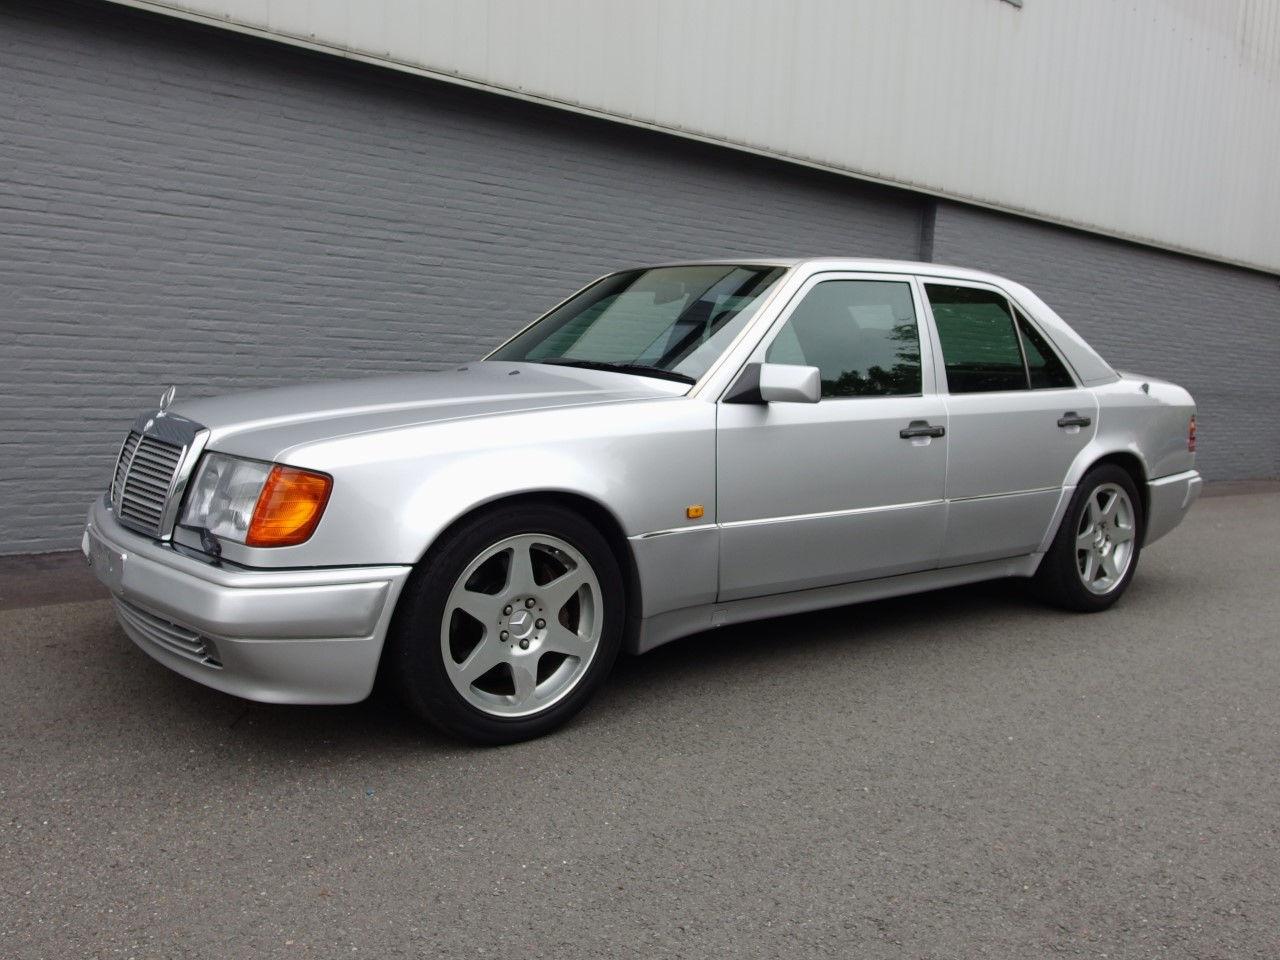 1993 mercedes benz w124 500e benztuning for Mercedes benz 500e